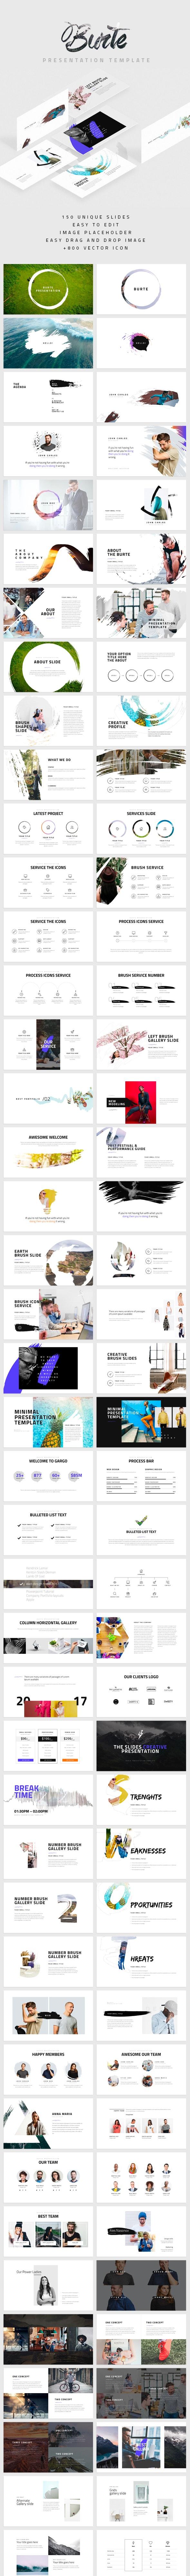 Burte Powerpoint Template - Abstract PowerPoint Templates